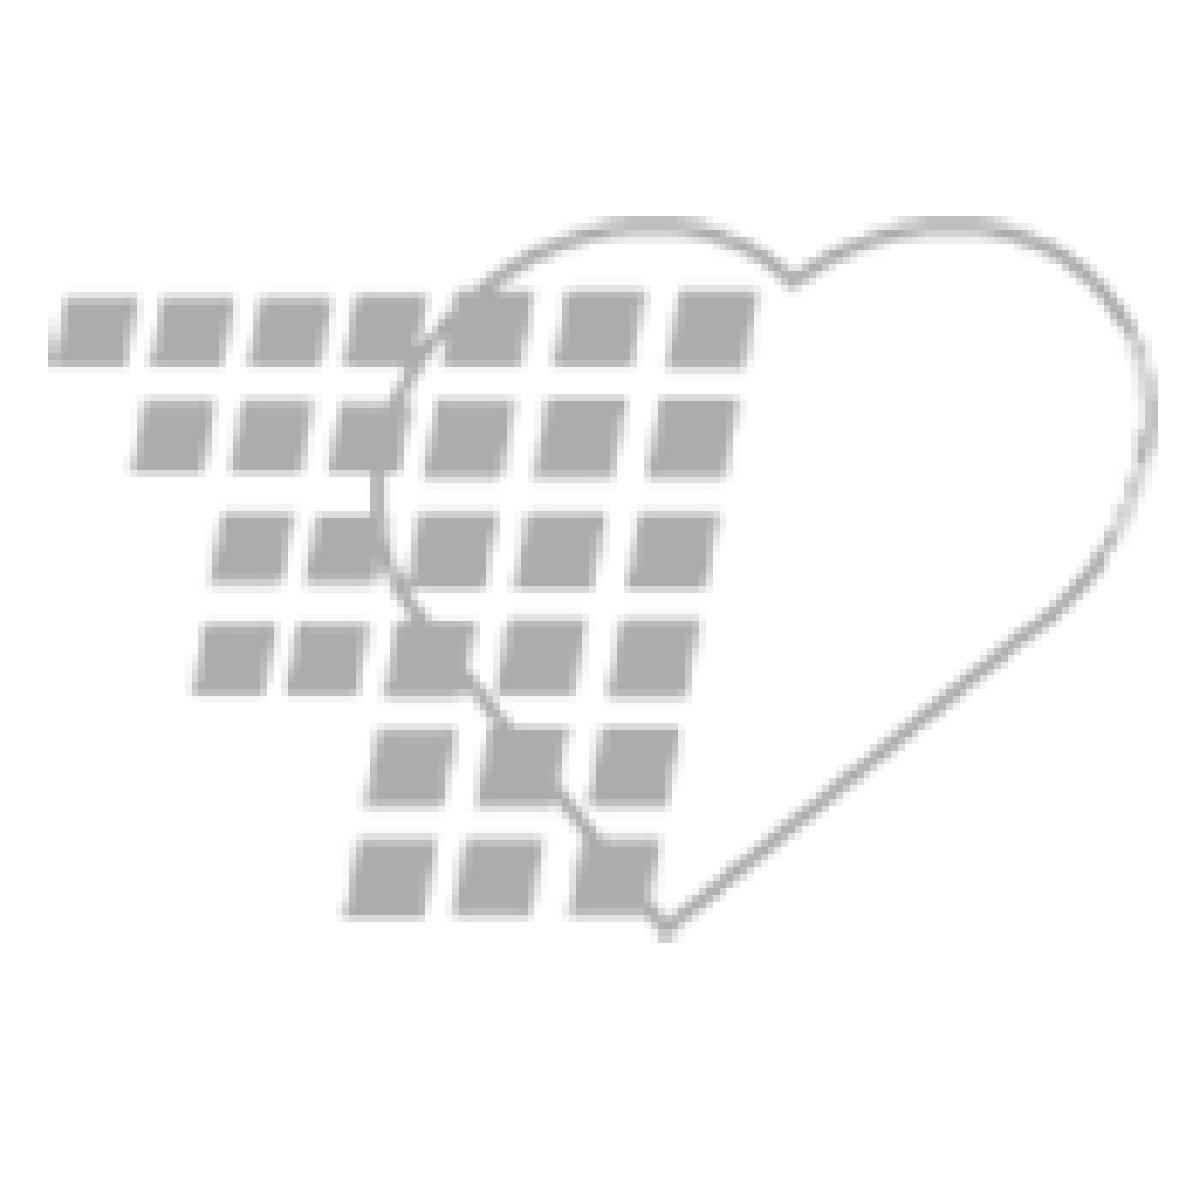 06-93-3119 Demo Dose® Narcn 10 mL MDV 0.4 mg/10 mL